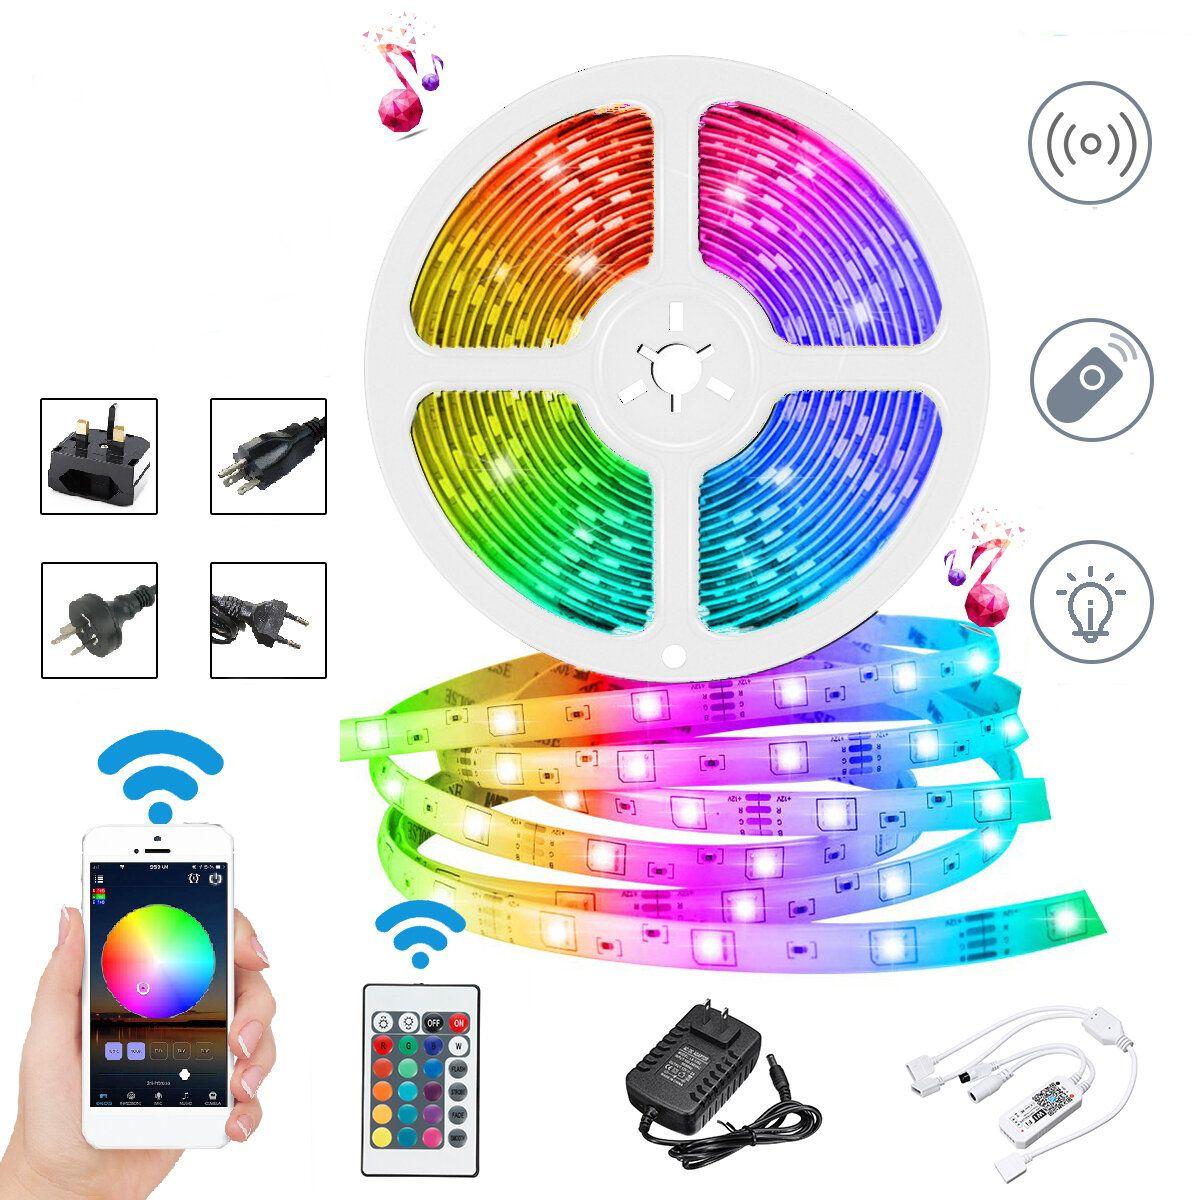 DC12V 10M Non waterproof DIY 2835 RGB WiFi Smart 600LED Strip Light Work With Alexa Google Home for Home Decor